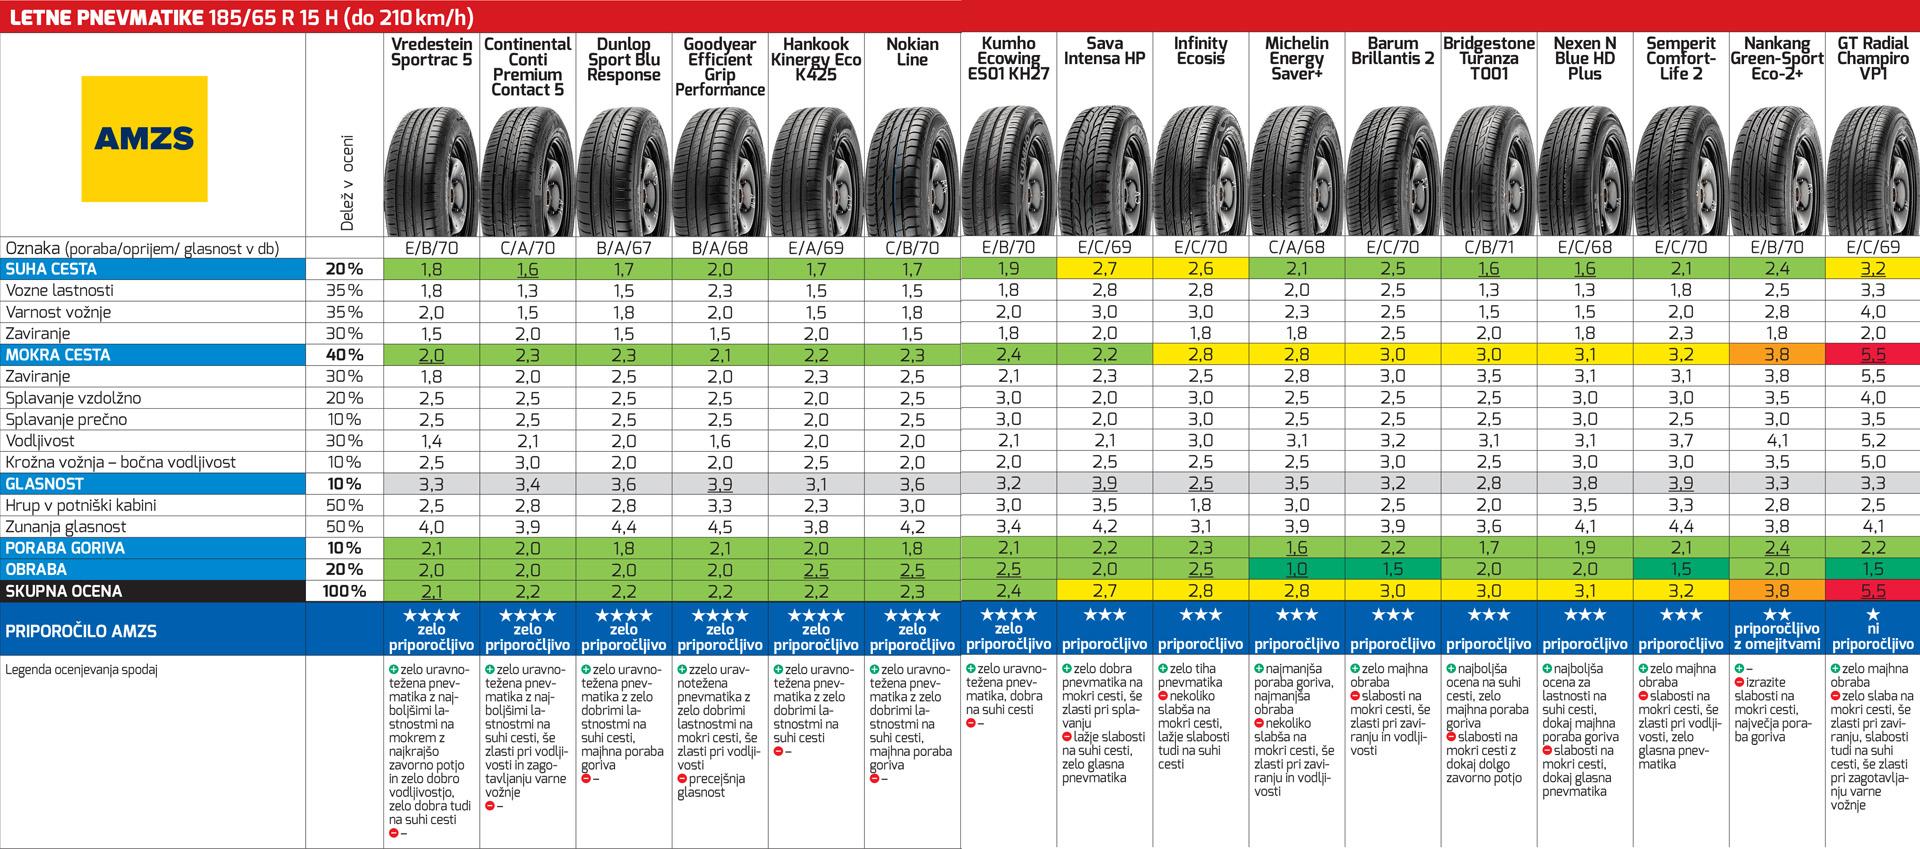 Blog - Letne pnevmatike 9